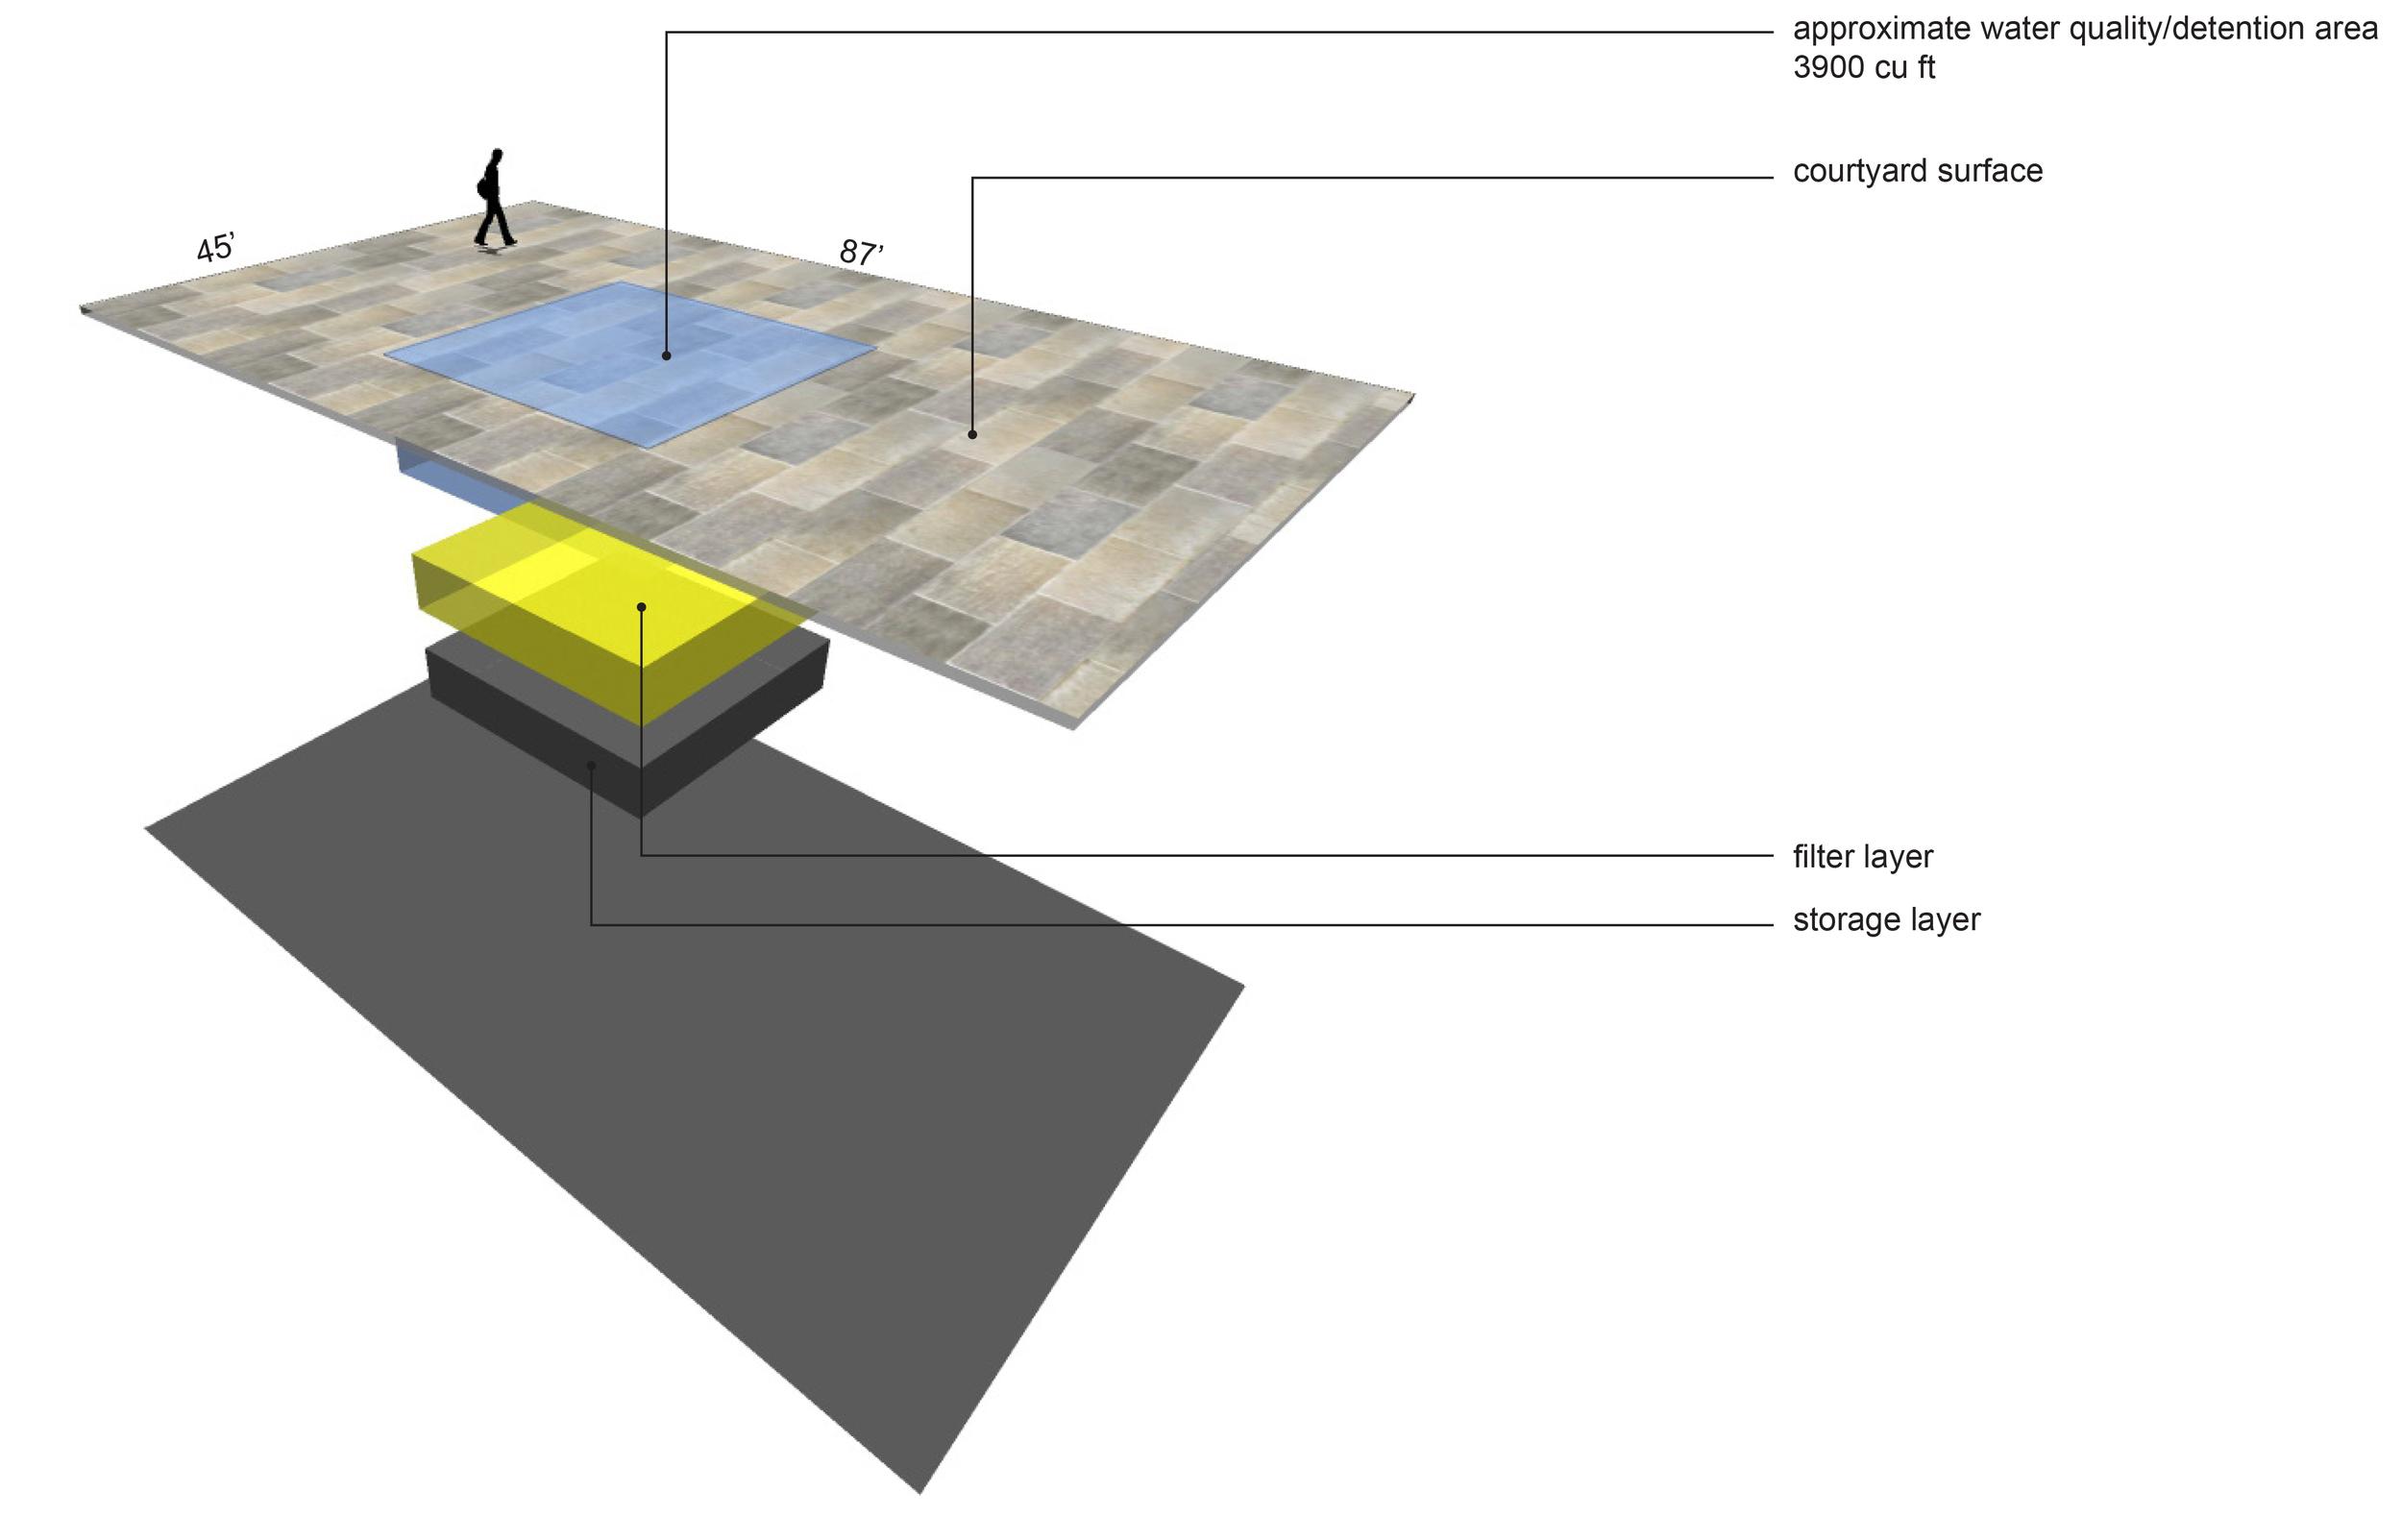 courtyard drainage diagram.jpg